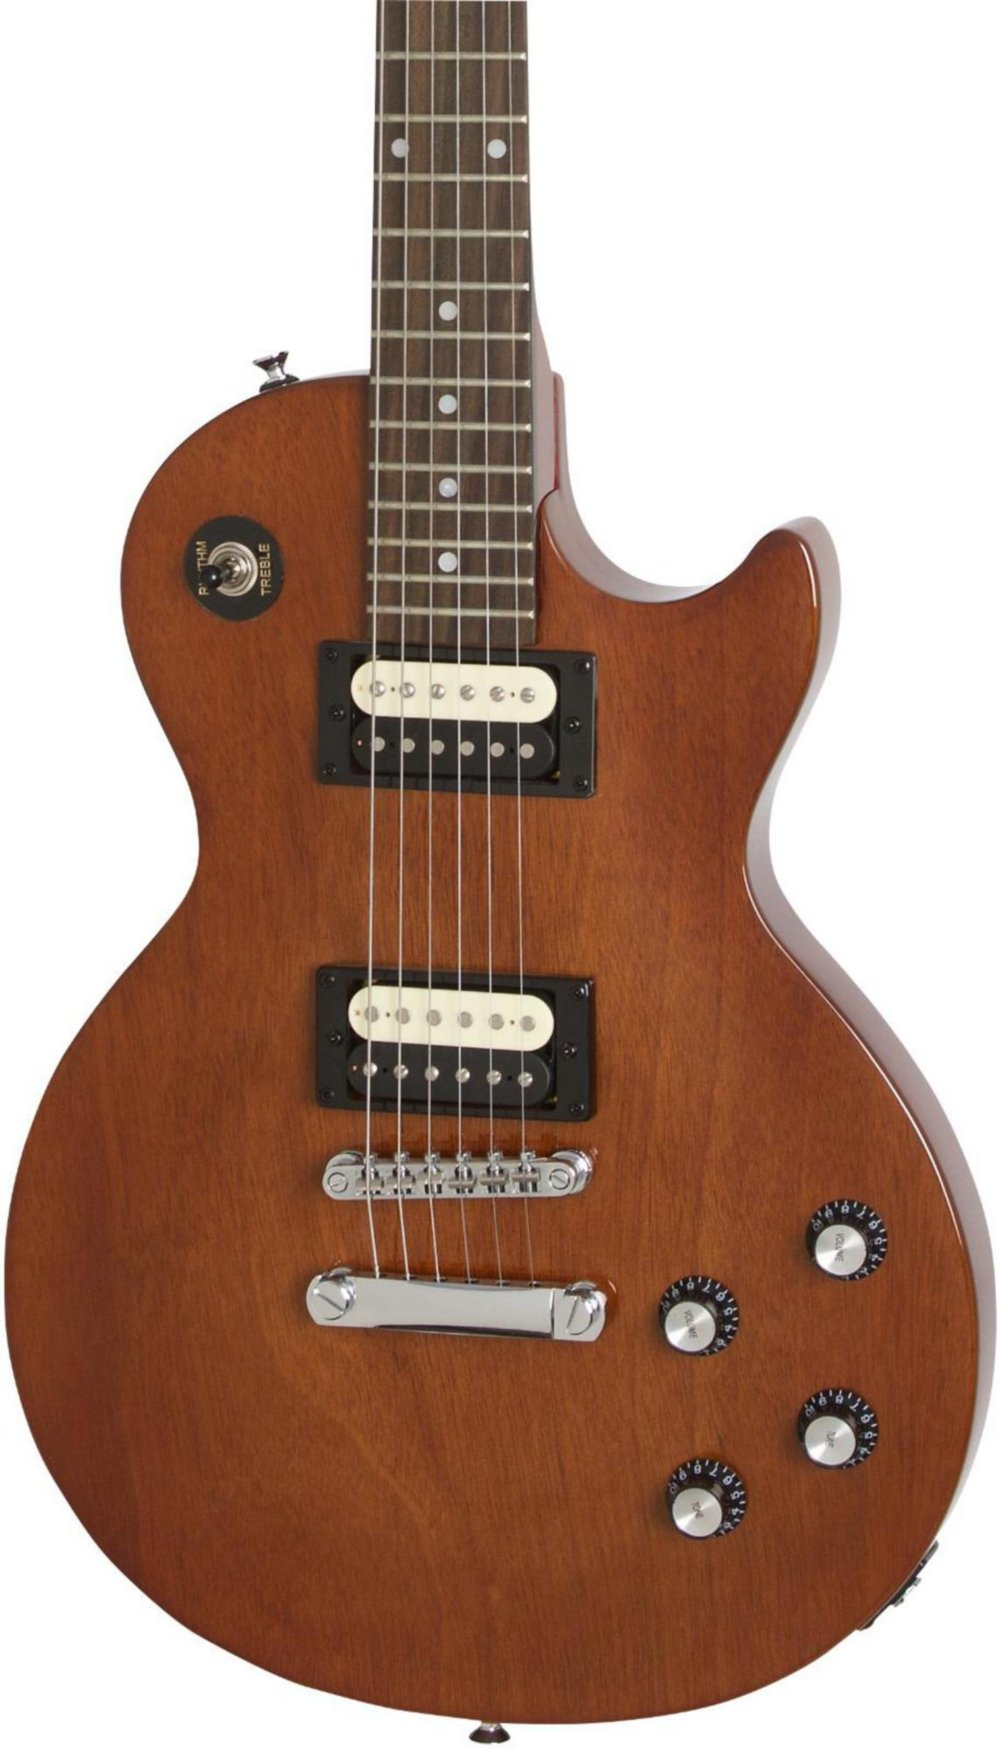 Epiphone ENPTWLNH1 Solid Body Electric Guitars Les Paul Studio LT, Walnut